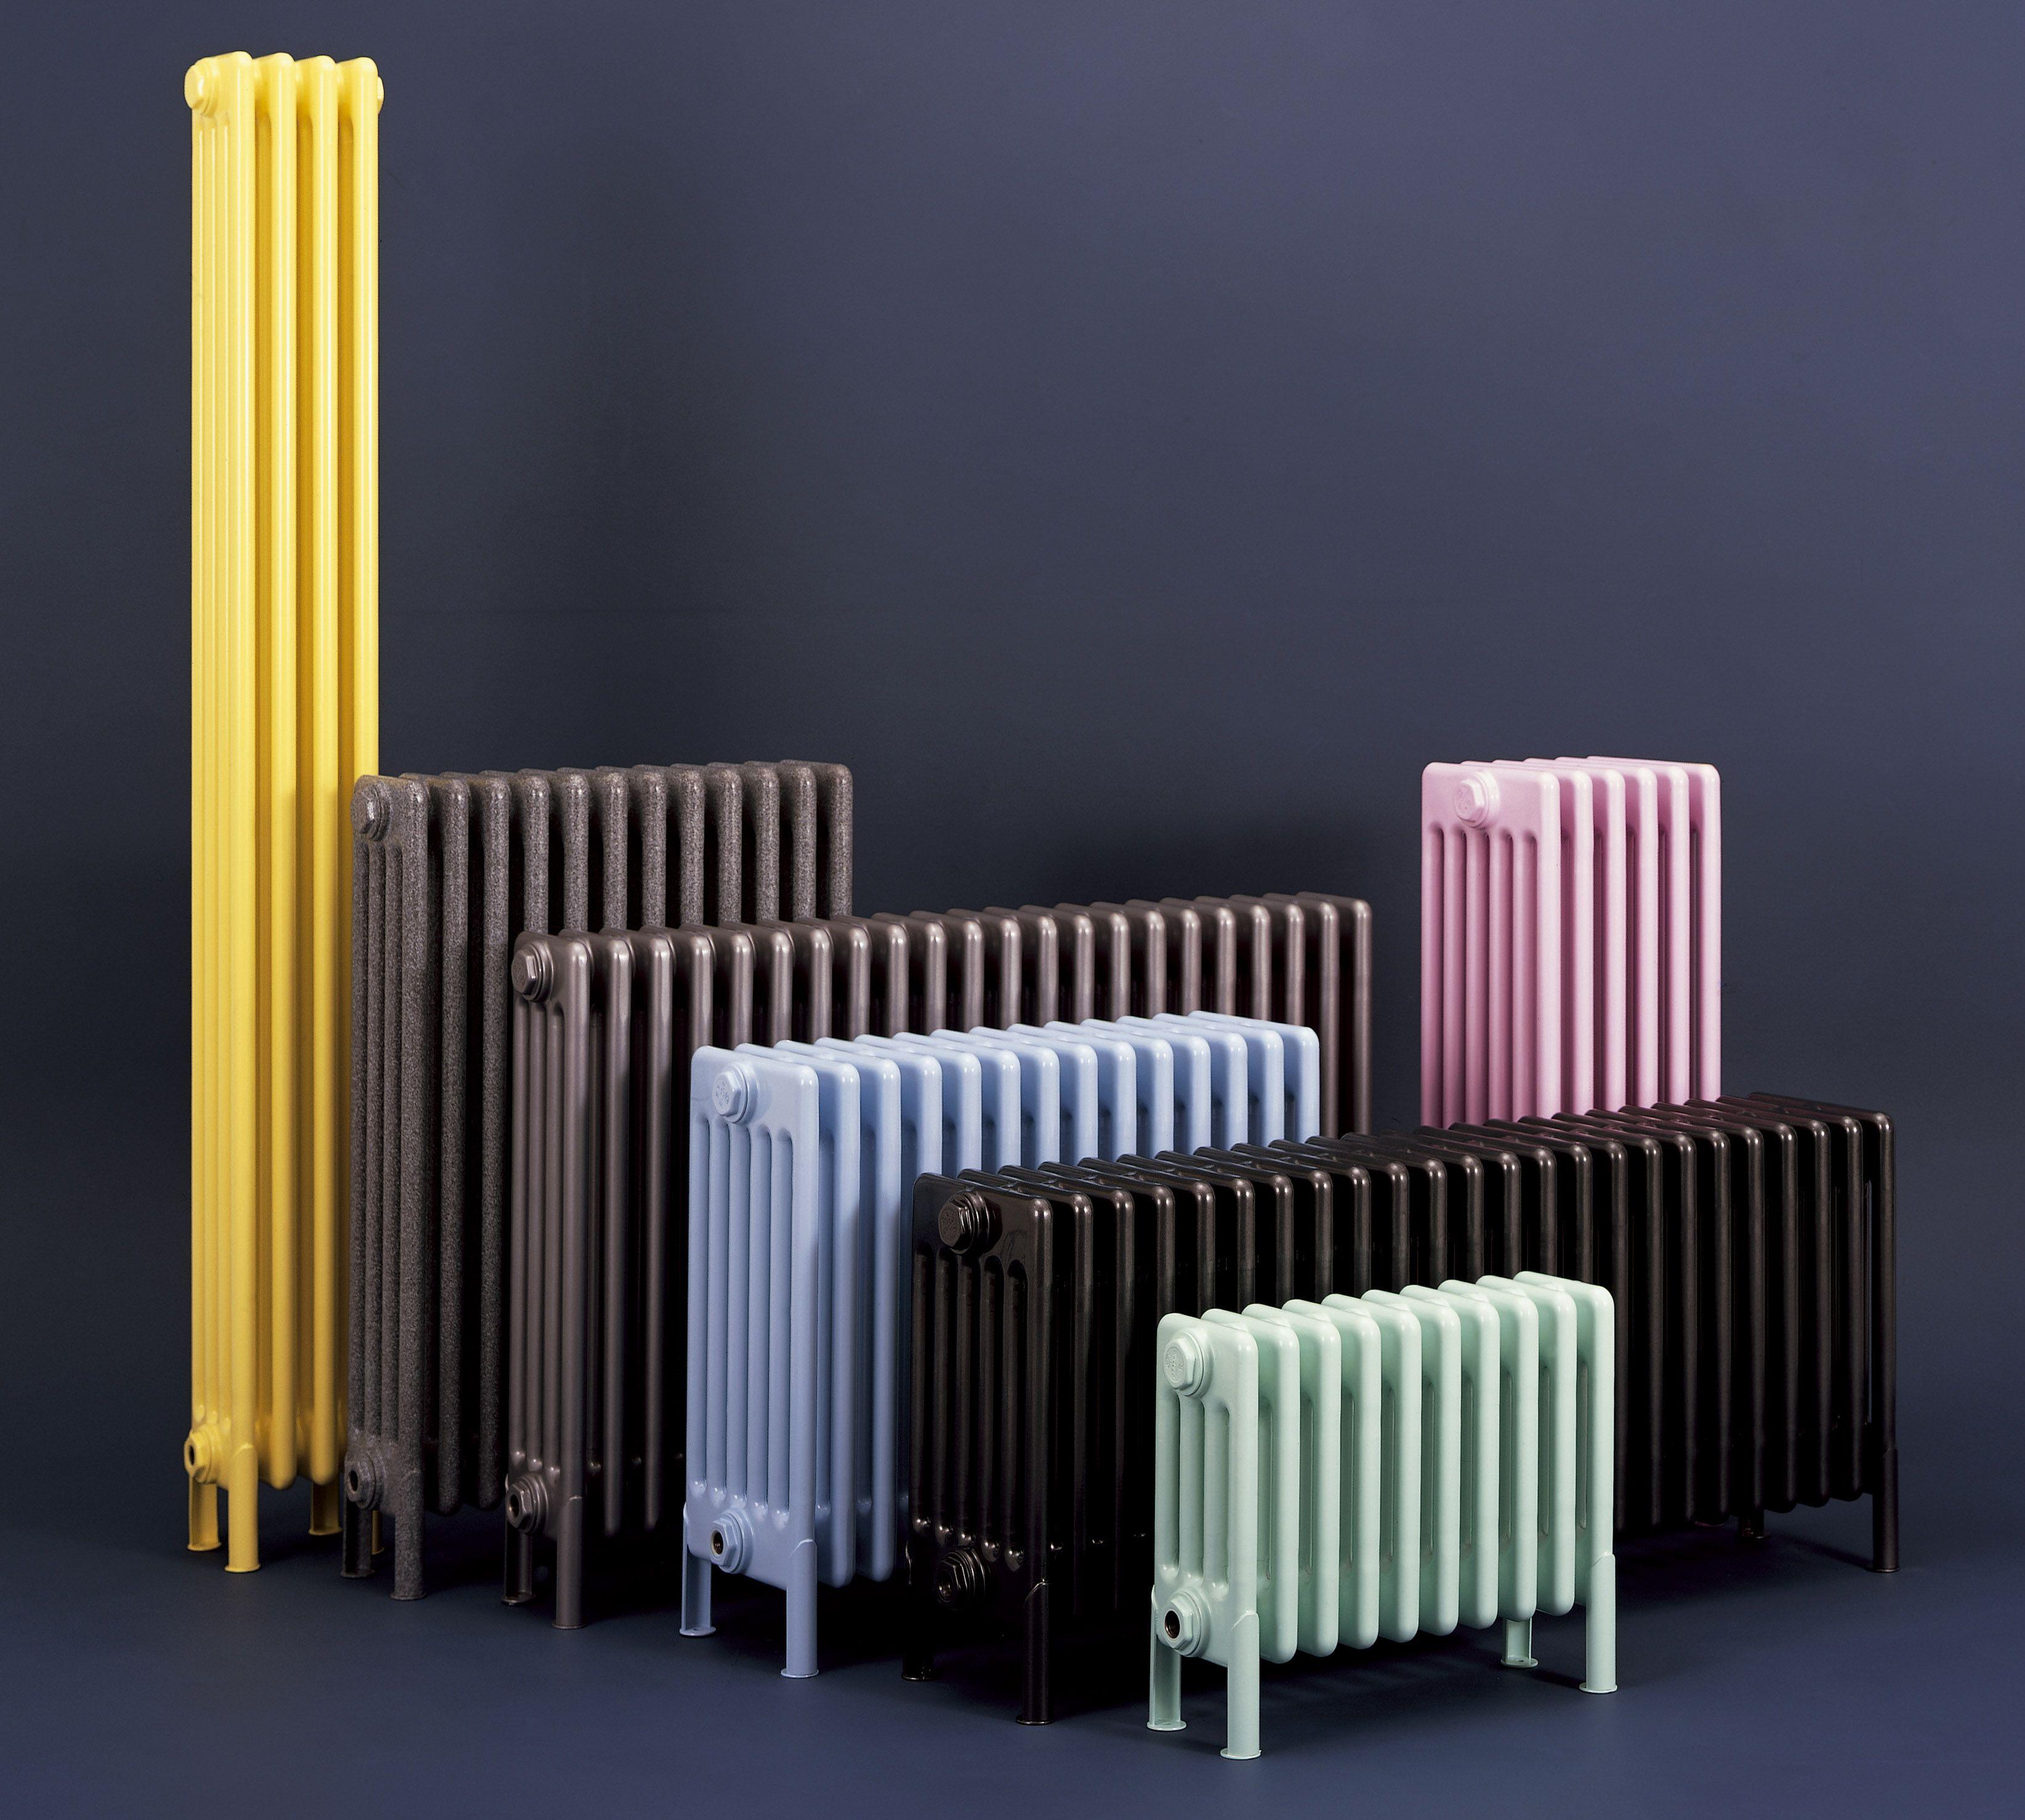 Bathroom radiators towel rails it is represent classic rectangular - Bisque Classic Radiators Jpg 3289 2956